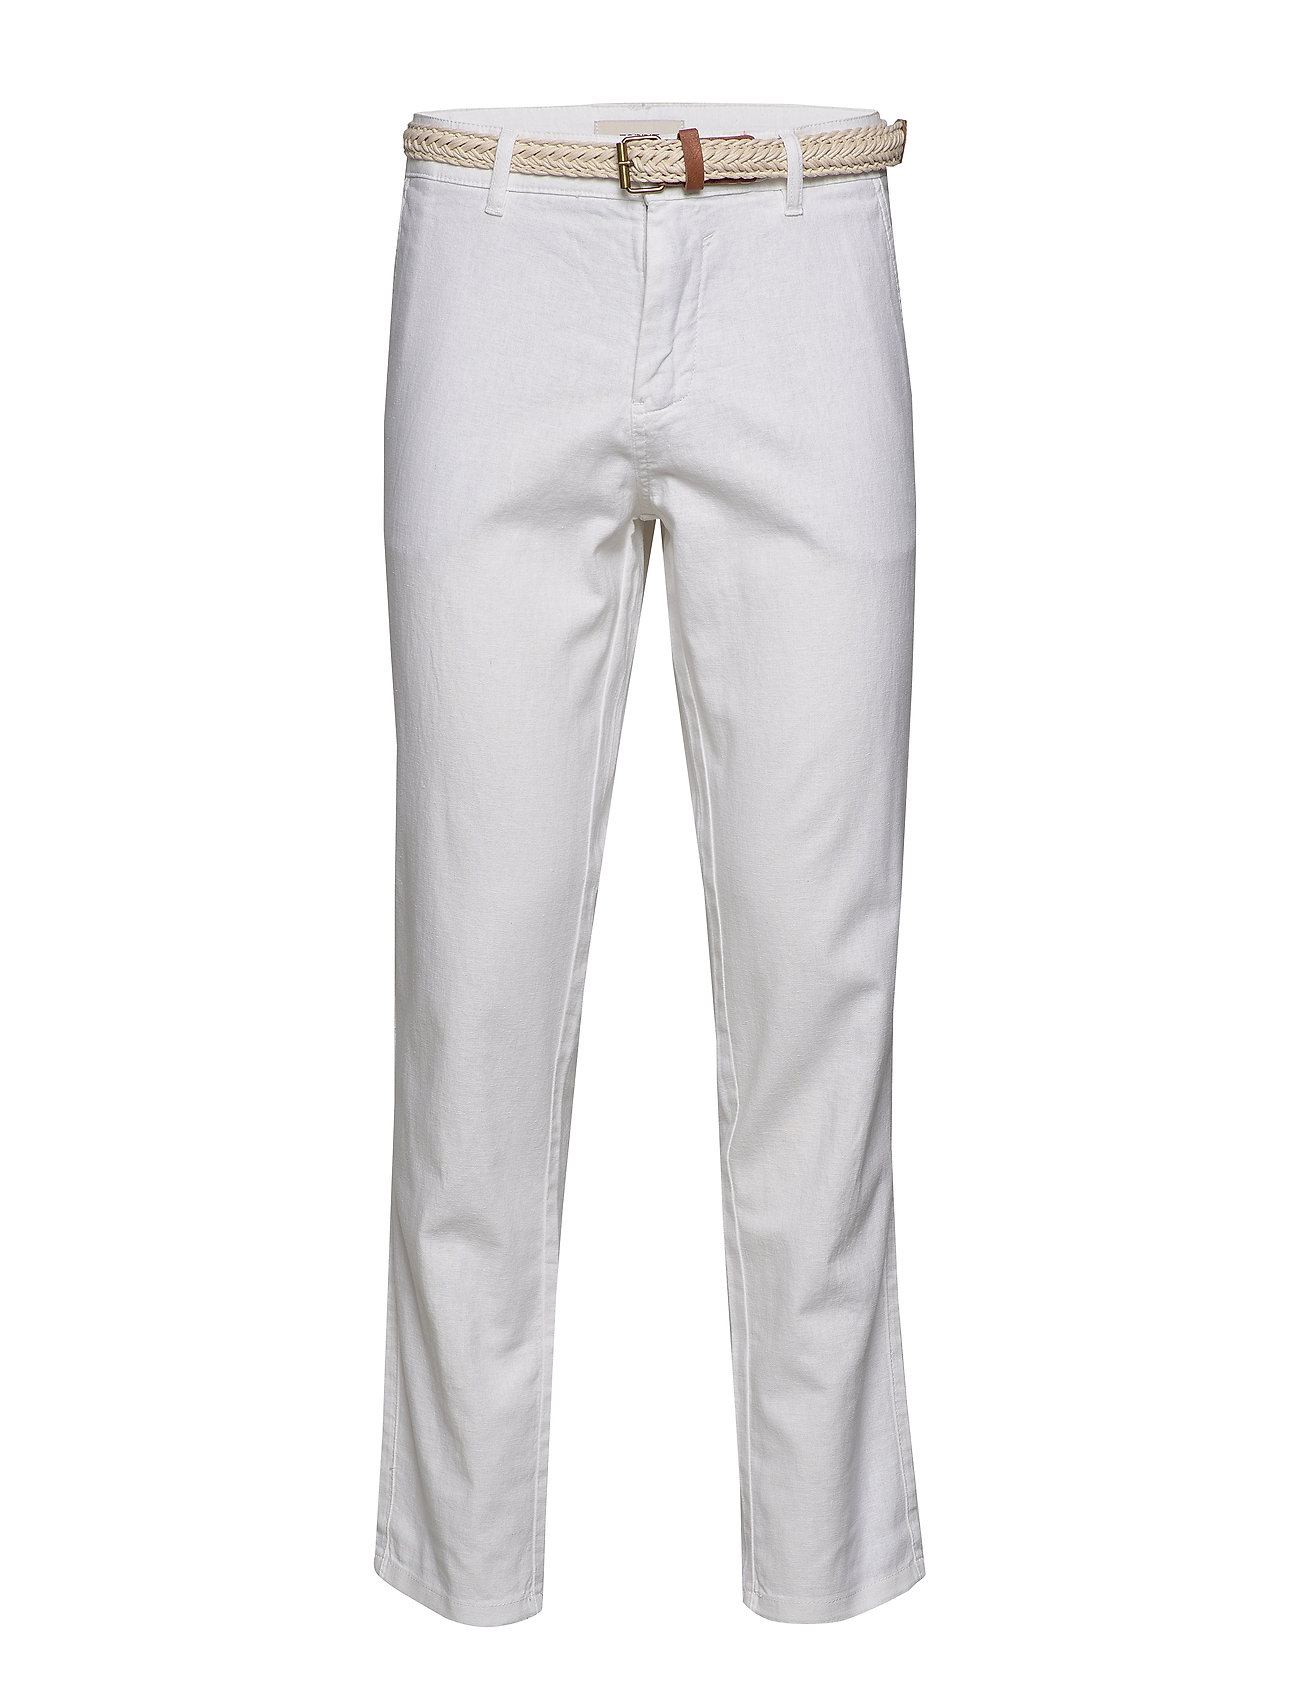 Esprit Casual Pants woven - WHITE